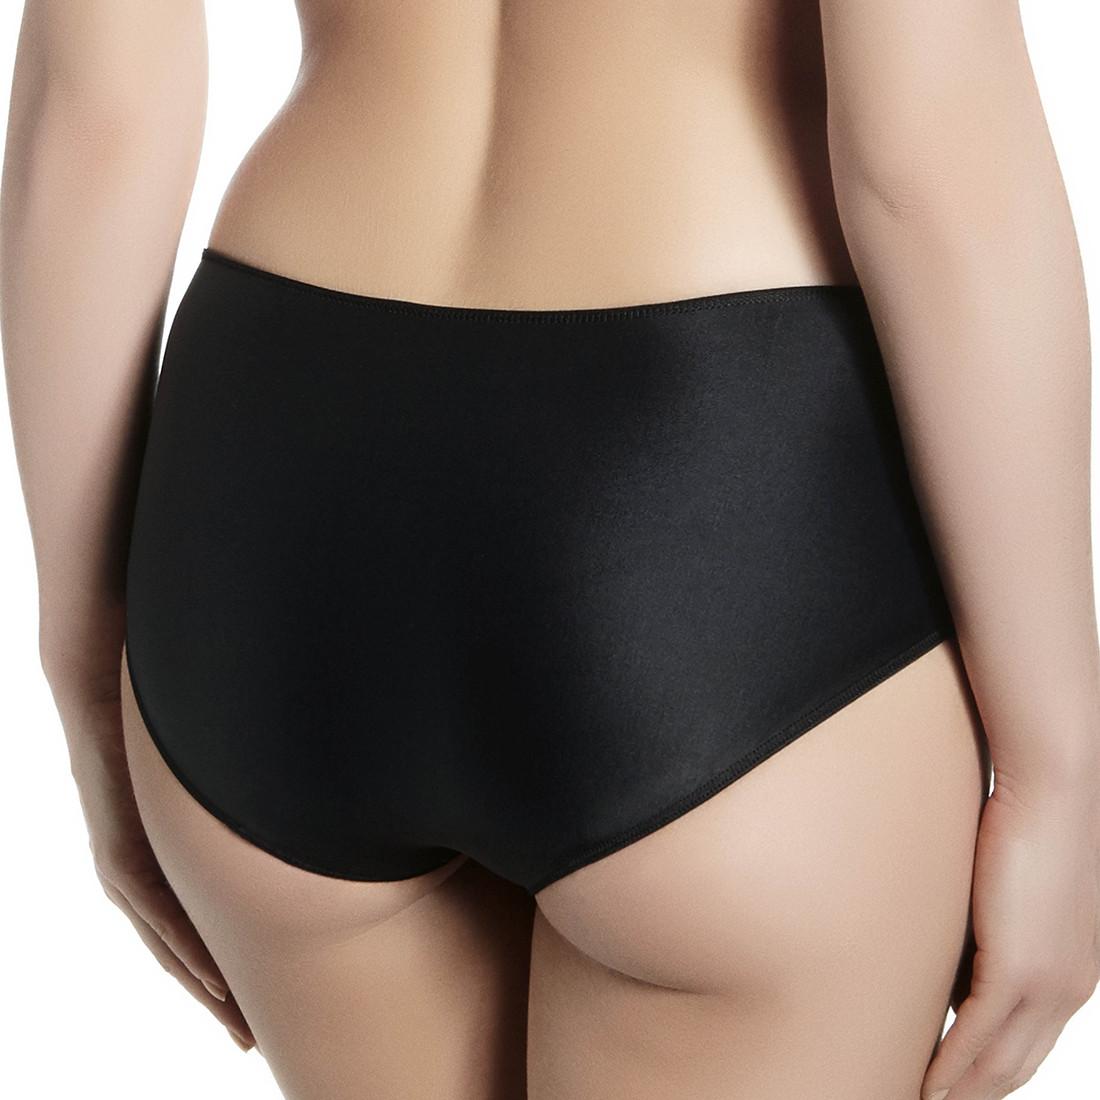 Culotte NUANCE Noir SIMONE PERELE - Intimidée lingerie